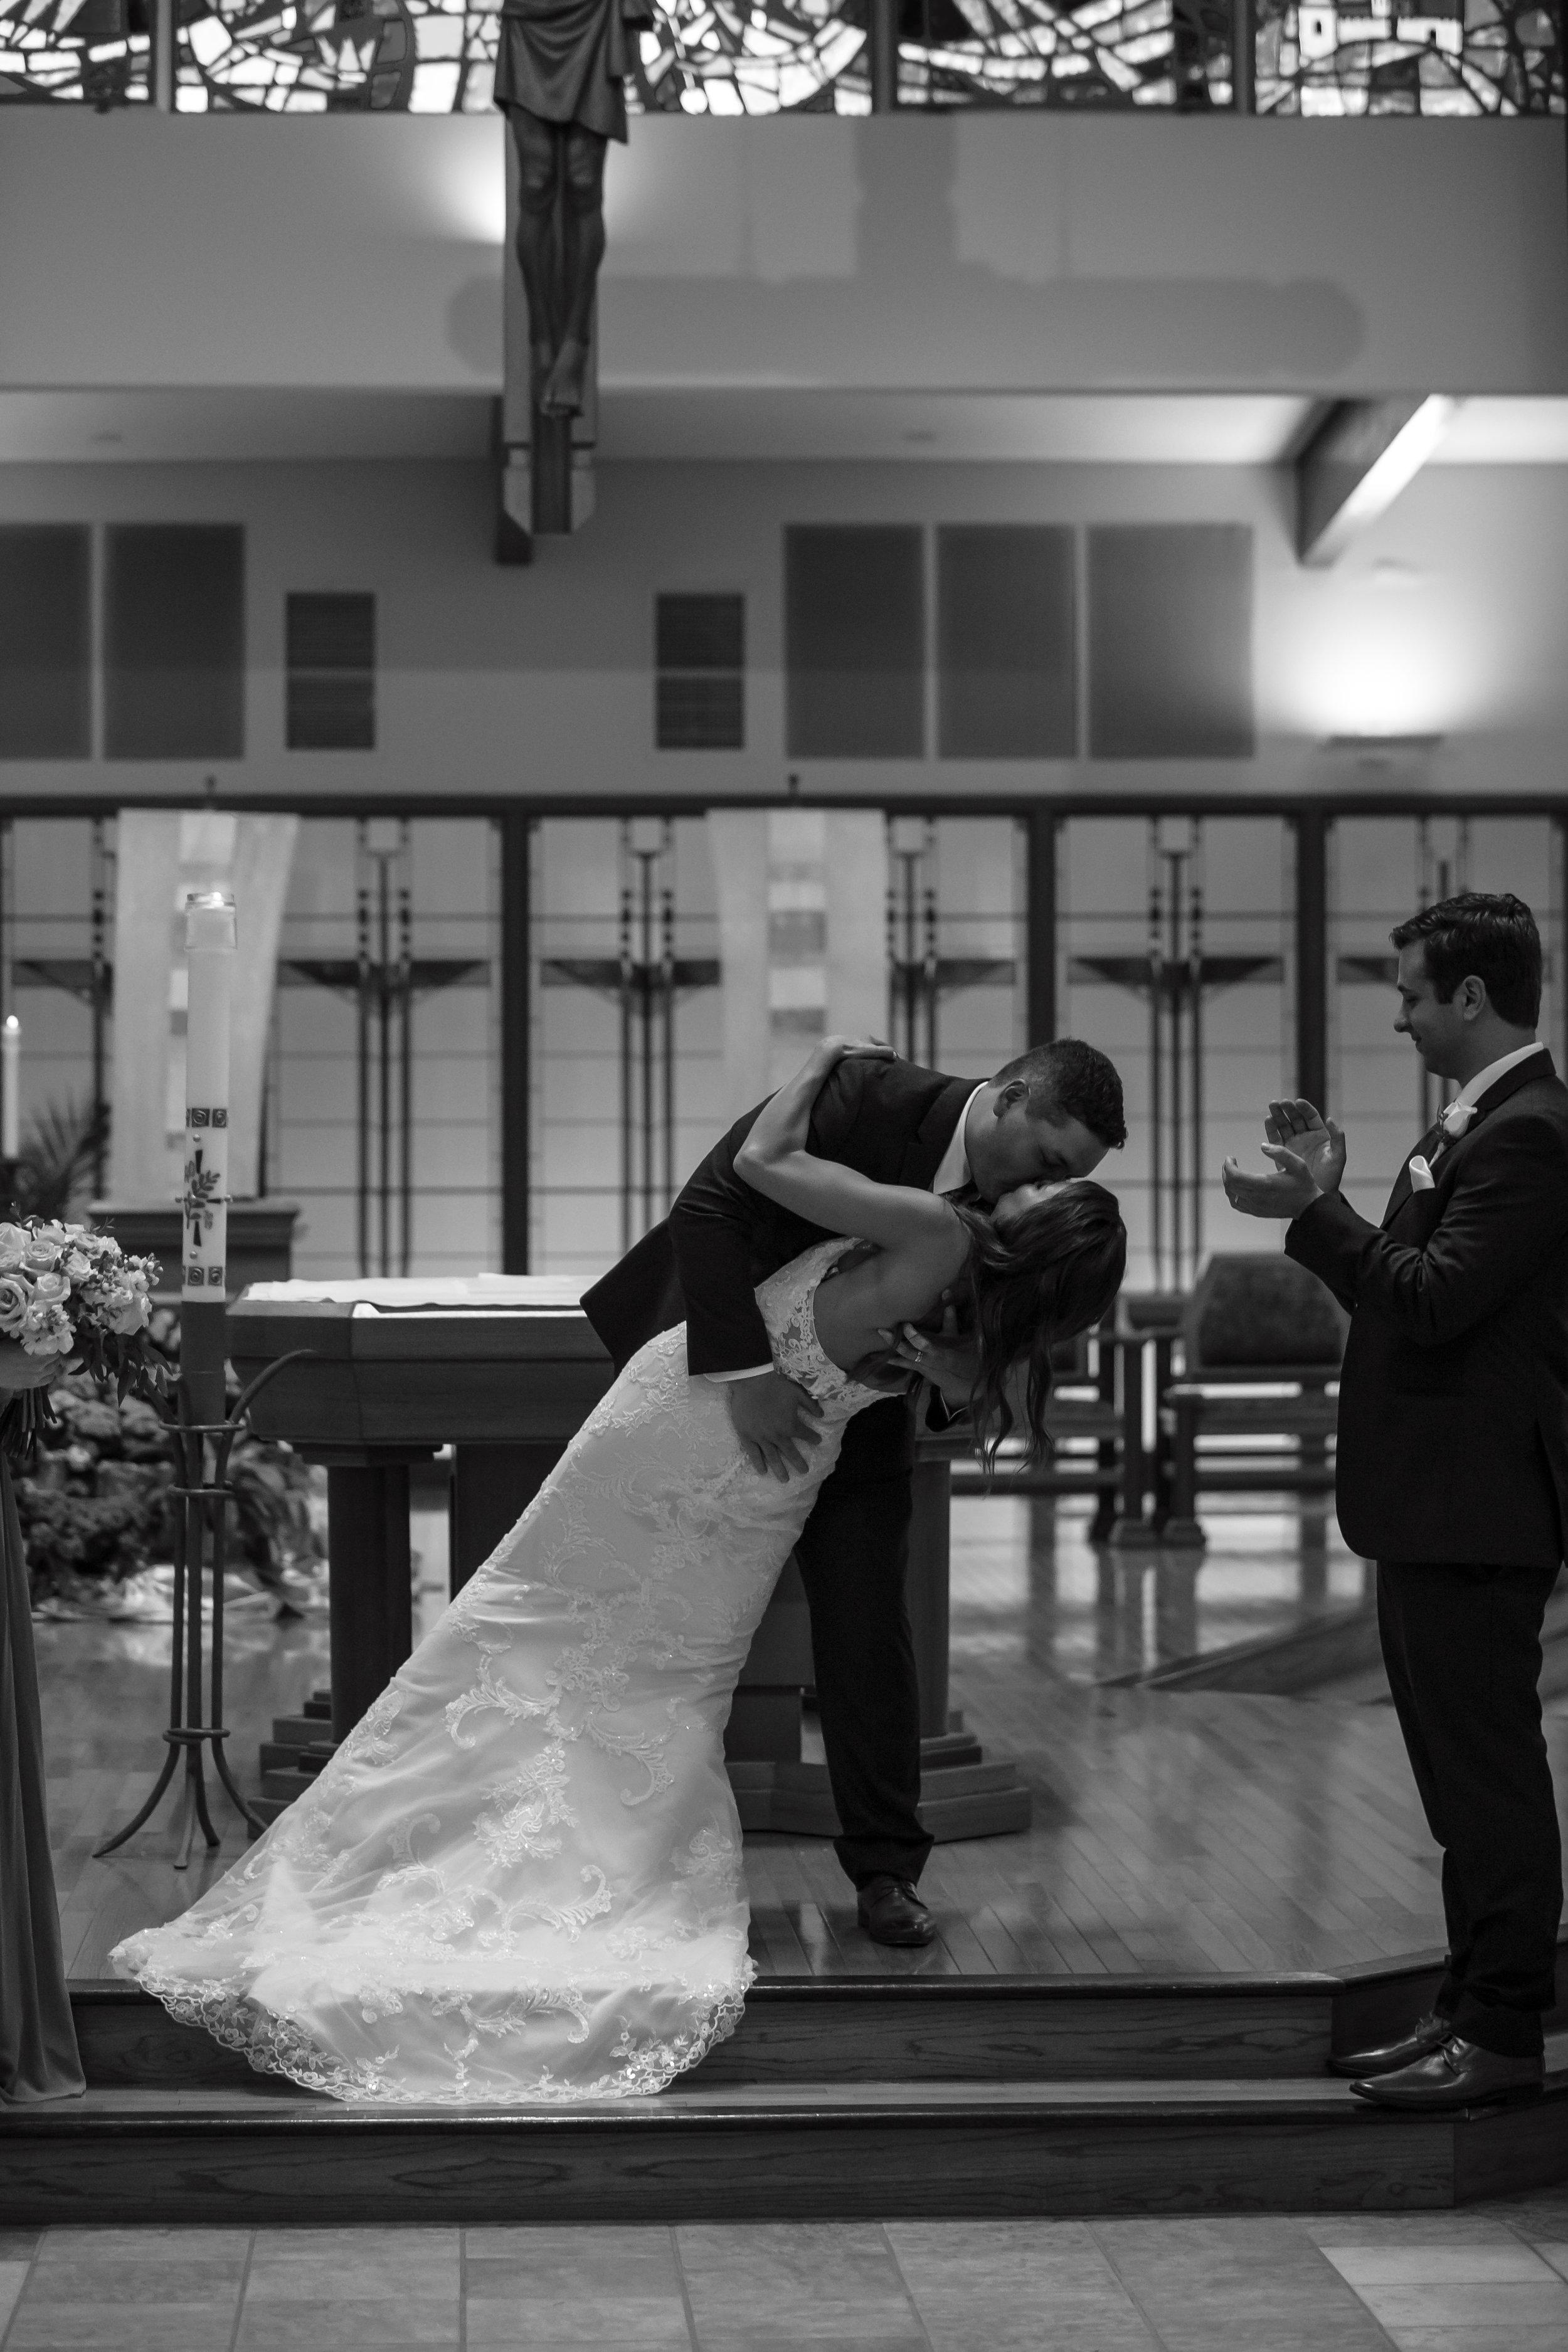 Bettendorf-wedding-kiss-St-John-Vianney-Church.jpg